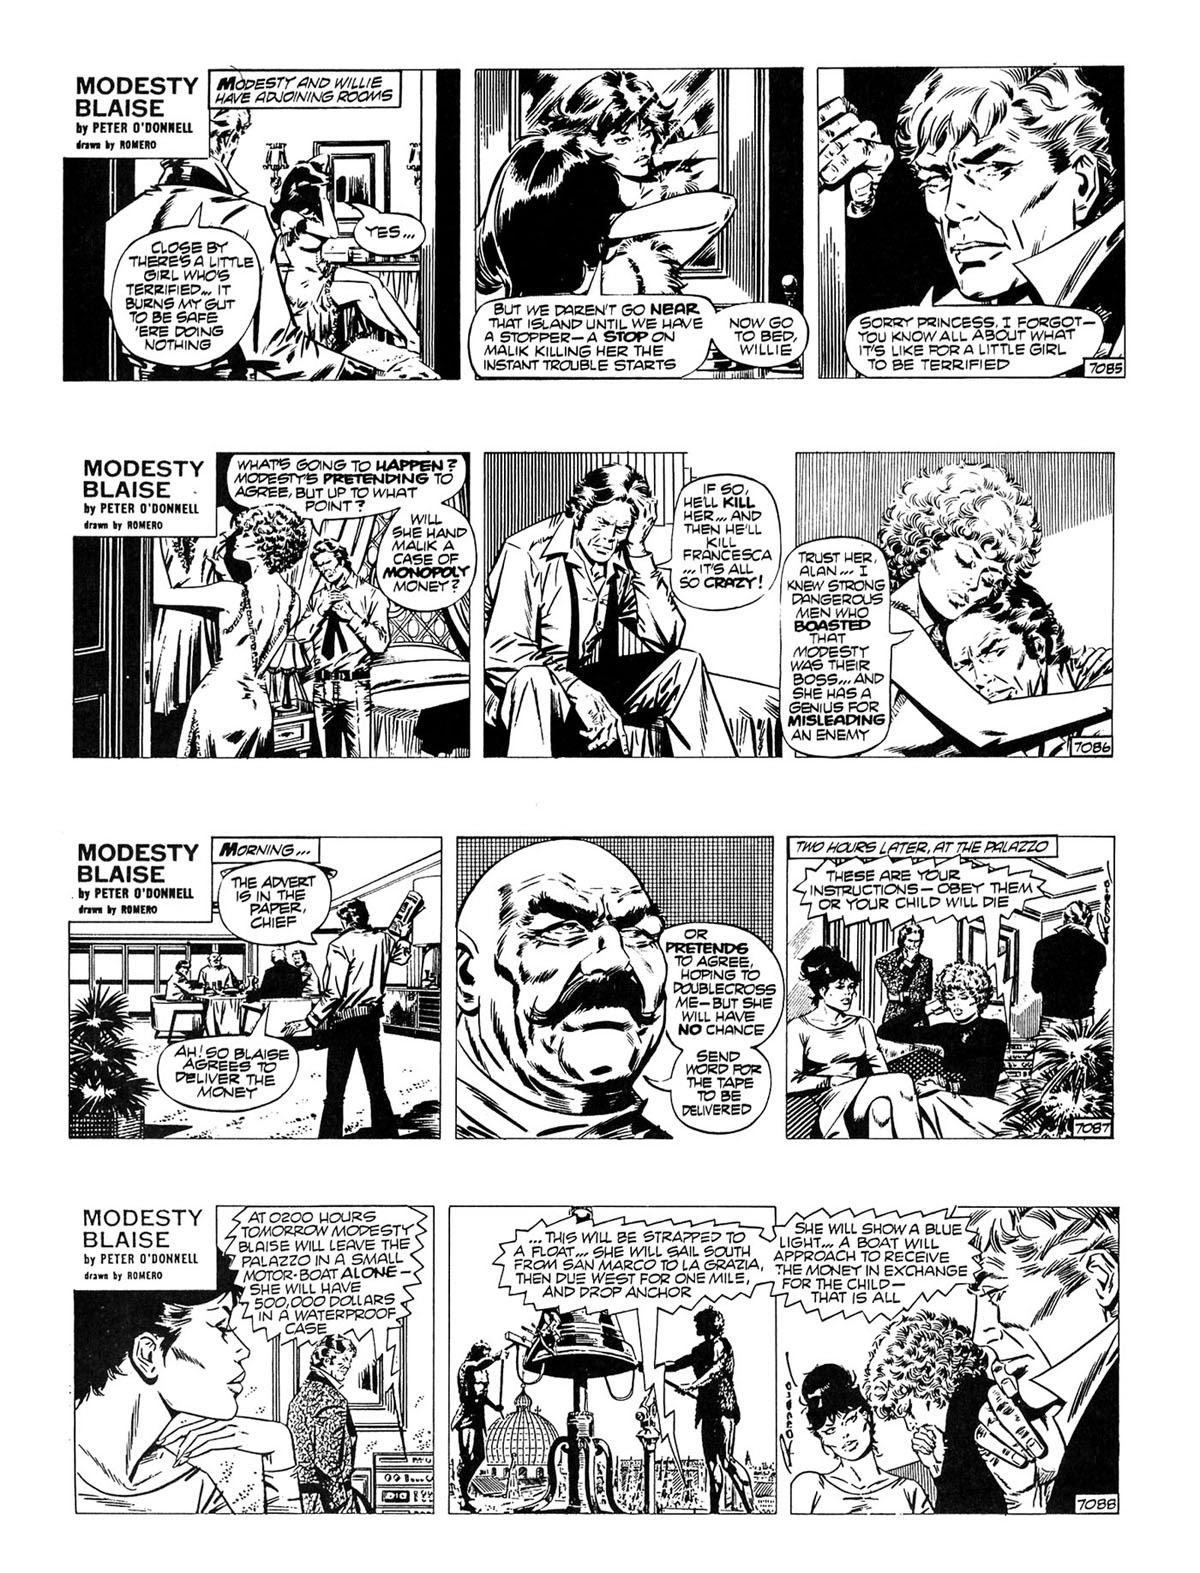 Read online Modesty Blaise Live bait comic -  Issue # TPB - 17